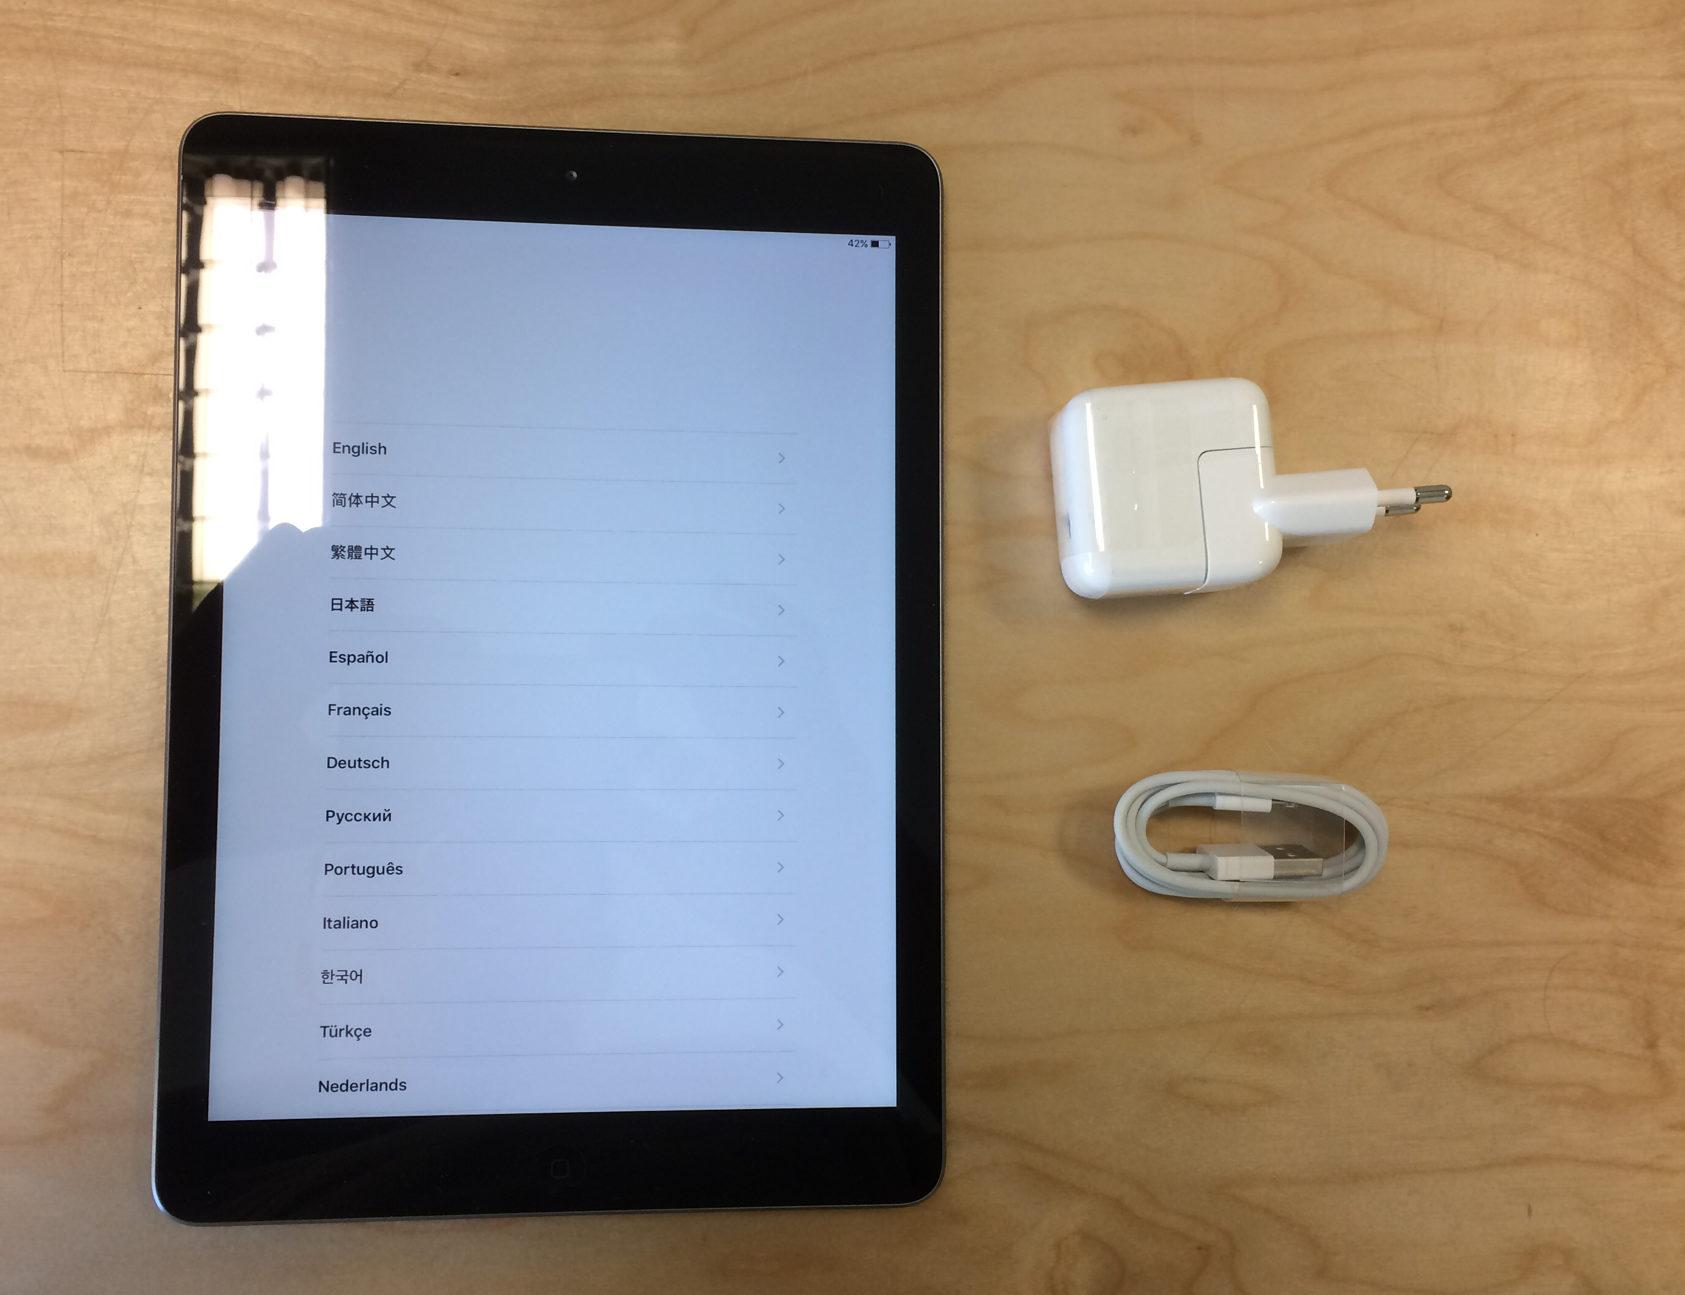 iPad Air (Wi-Fi), 16 GB, Space Gray, imagen 1